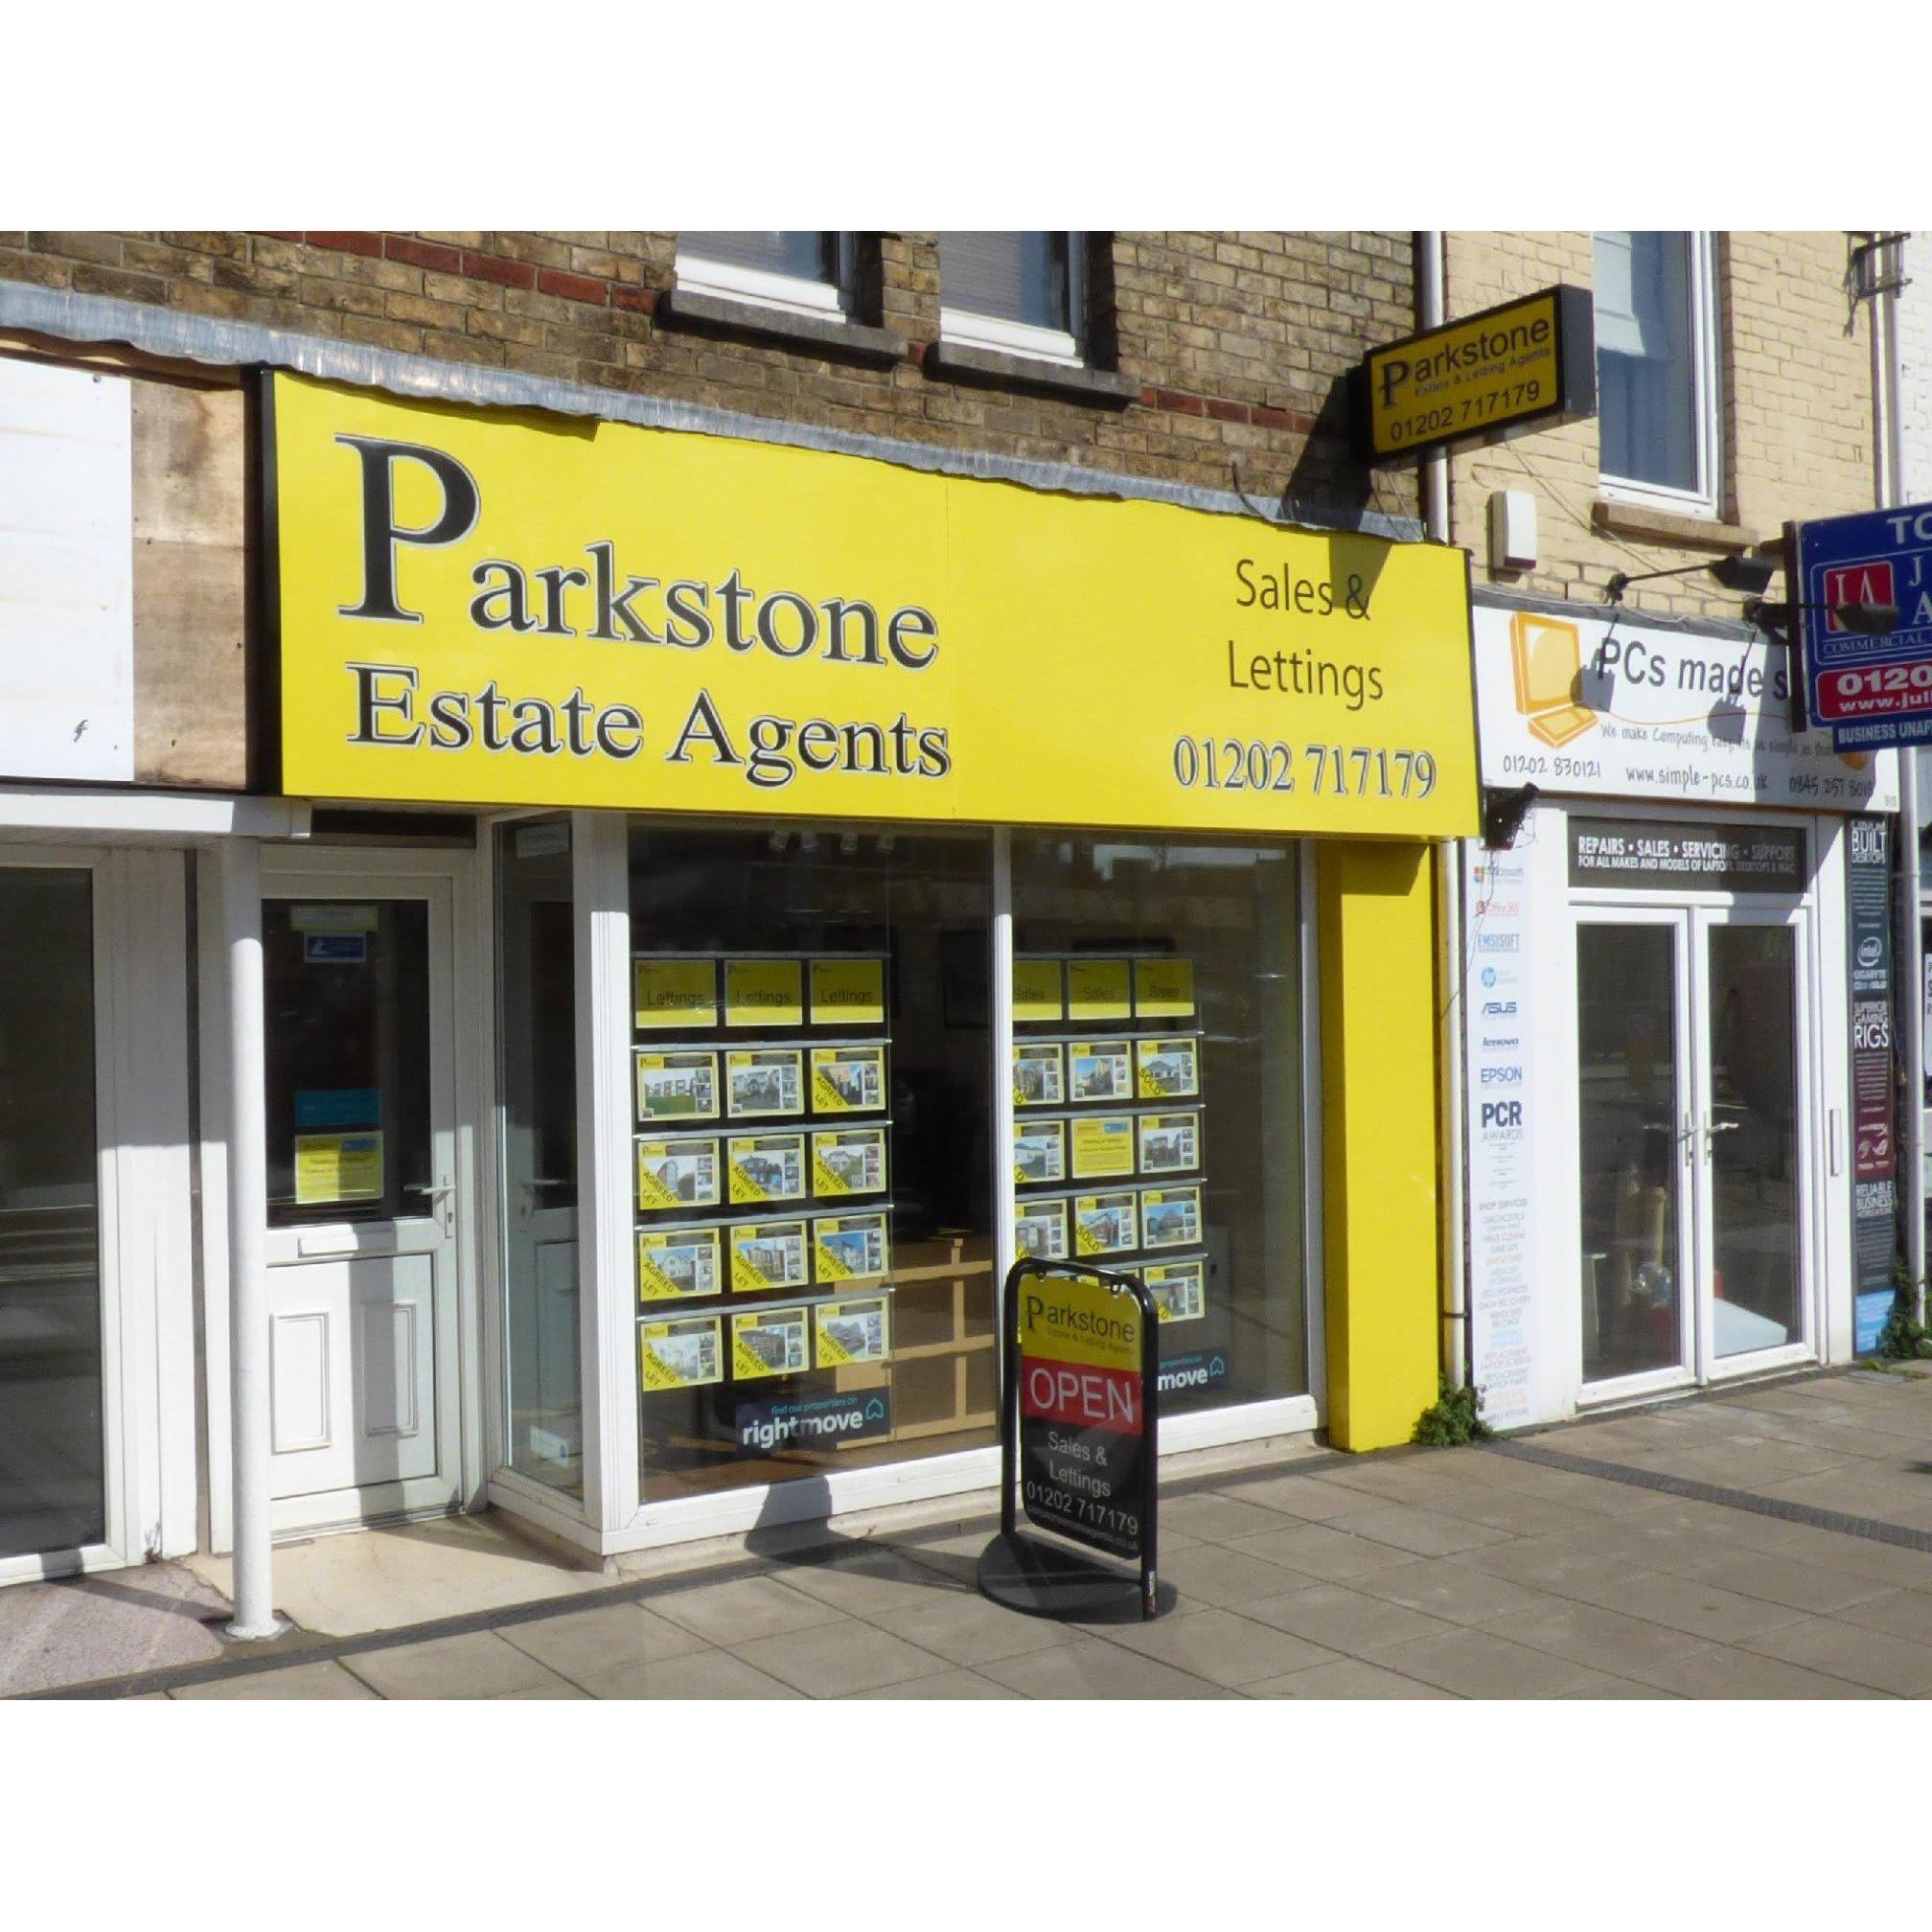 Parkstone Estate & Letting Agents - Poole, Dorset BH14 9DF - 01202 717179 | ShowMeLocal.com